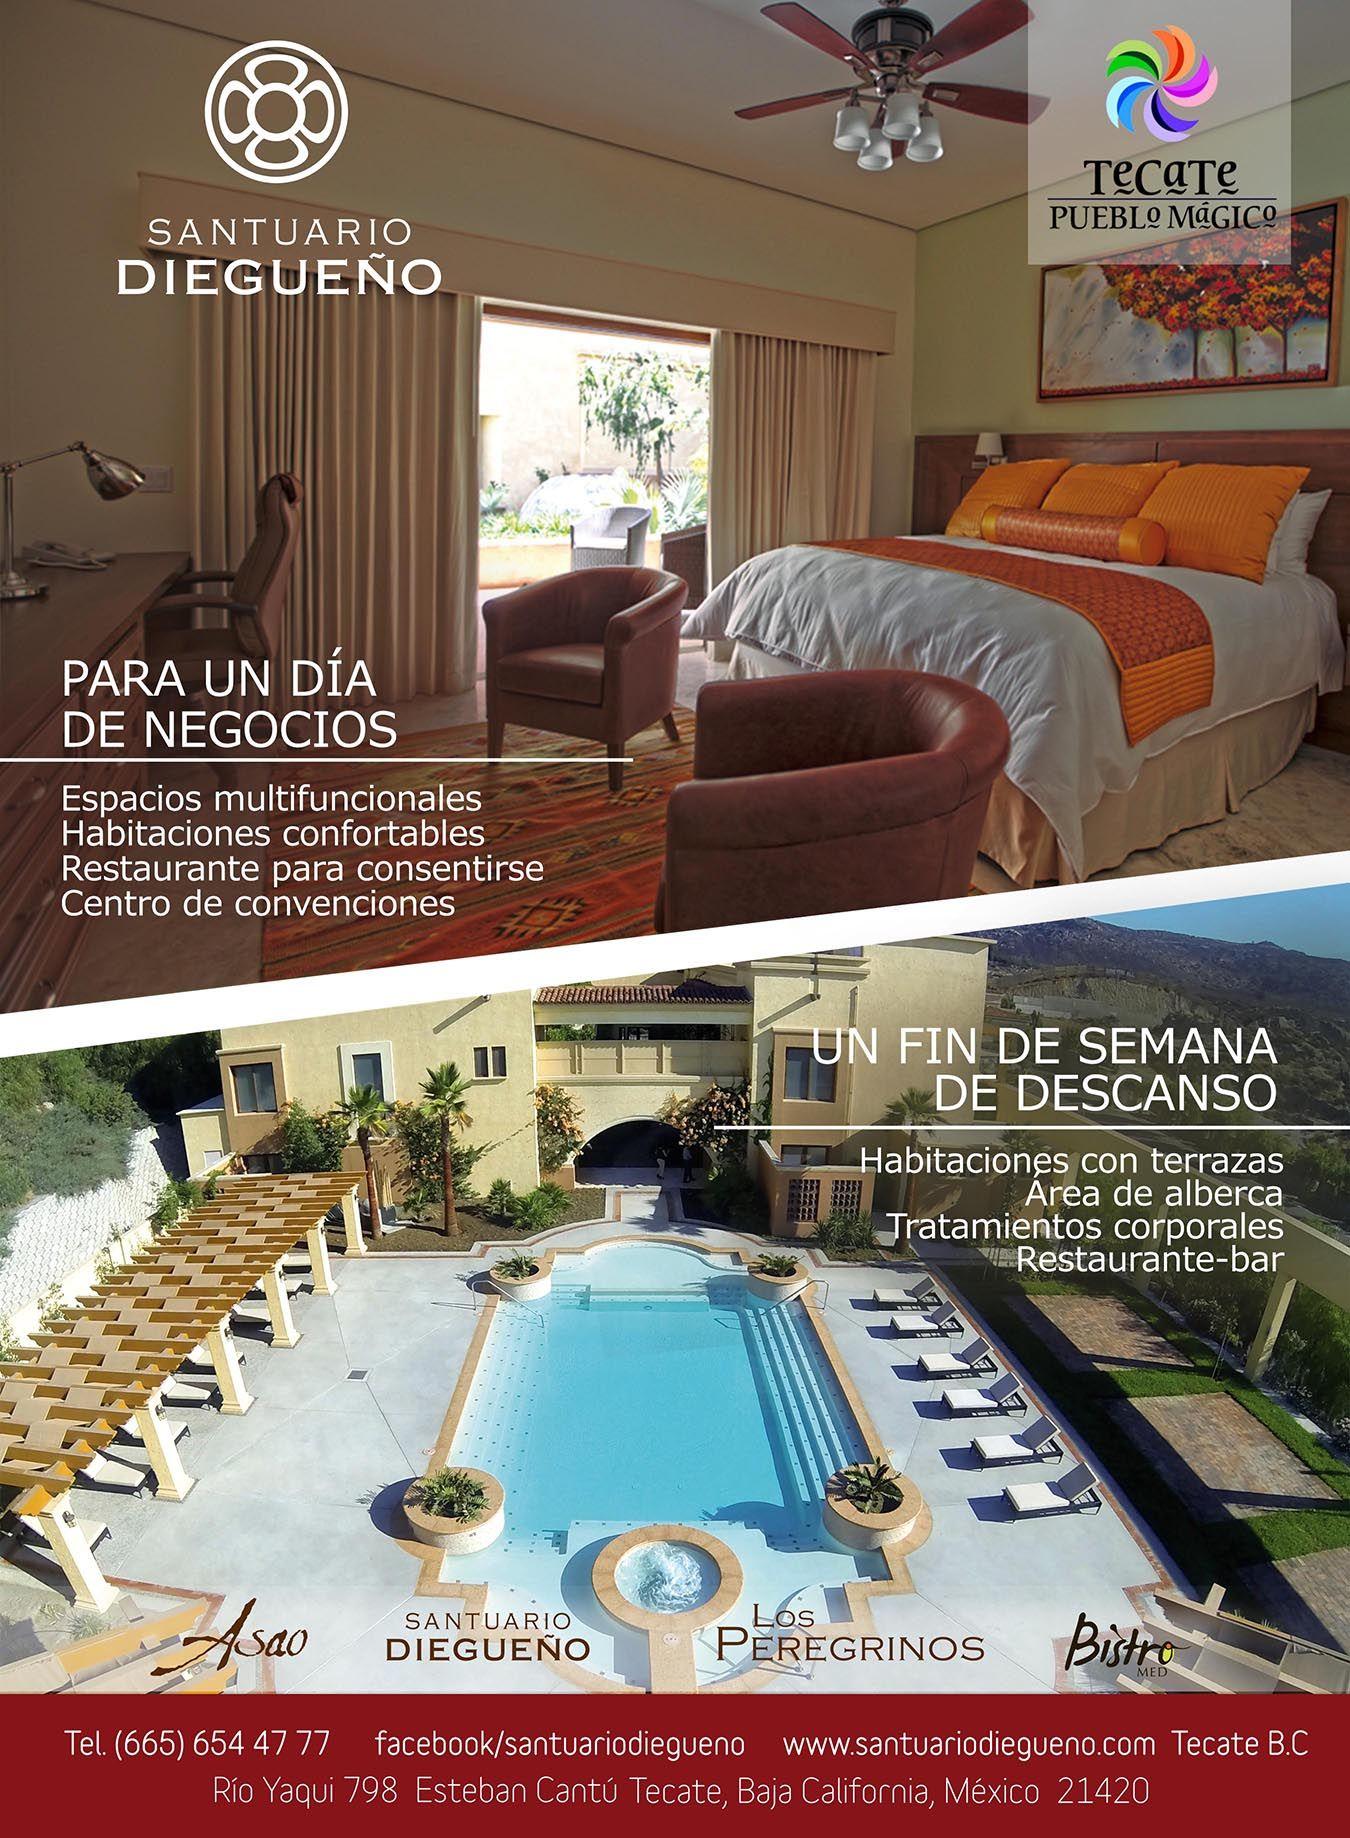 Socialevent Professionalevent Events Habitaciones Confortables